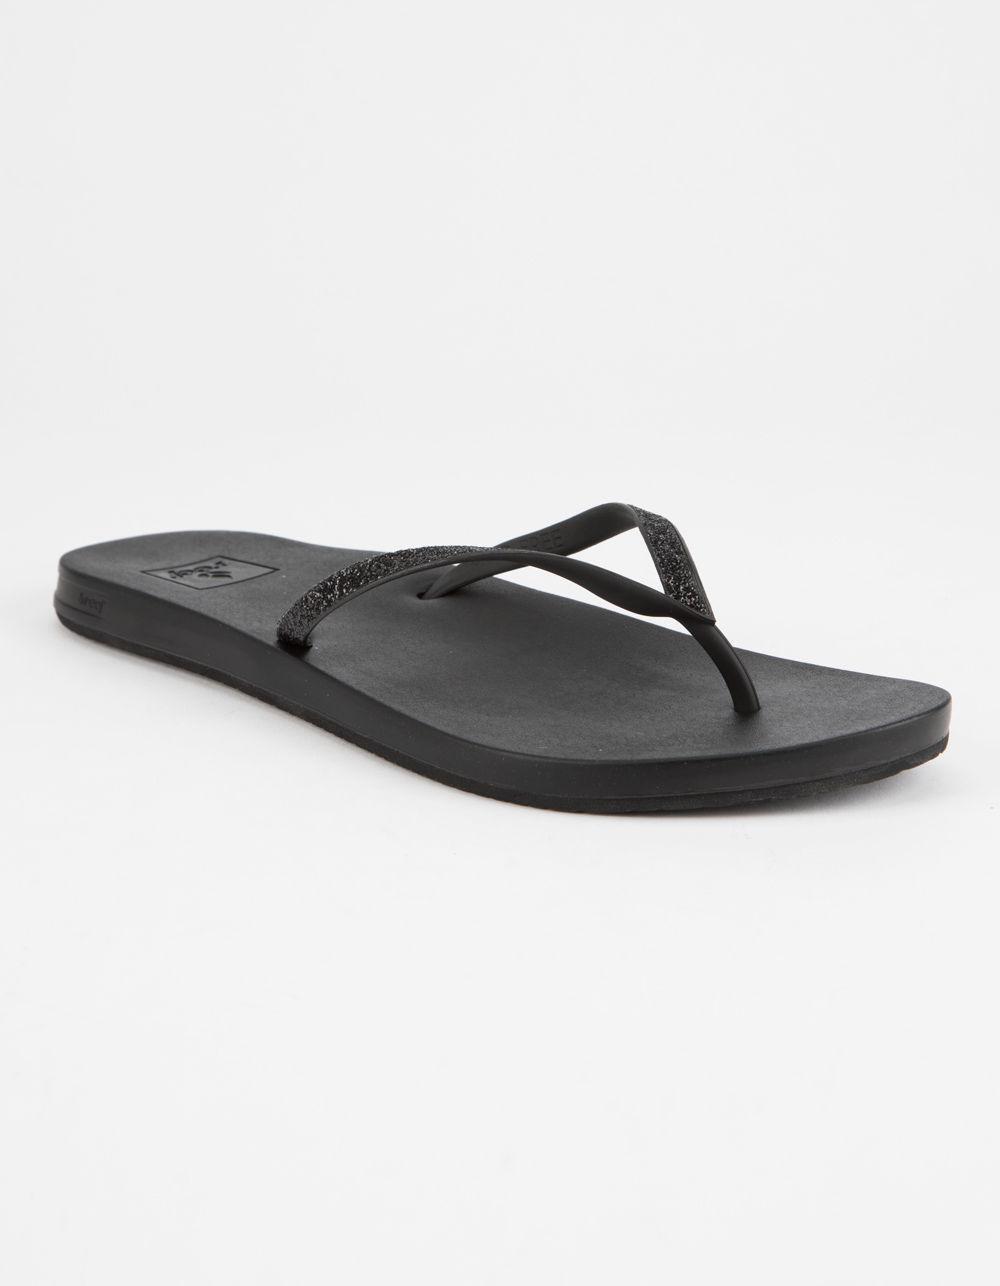 09f06048a551 Lyst - Reef Cushion Bounce Stargazer Womens Sandals in Black